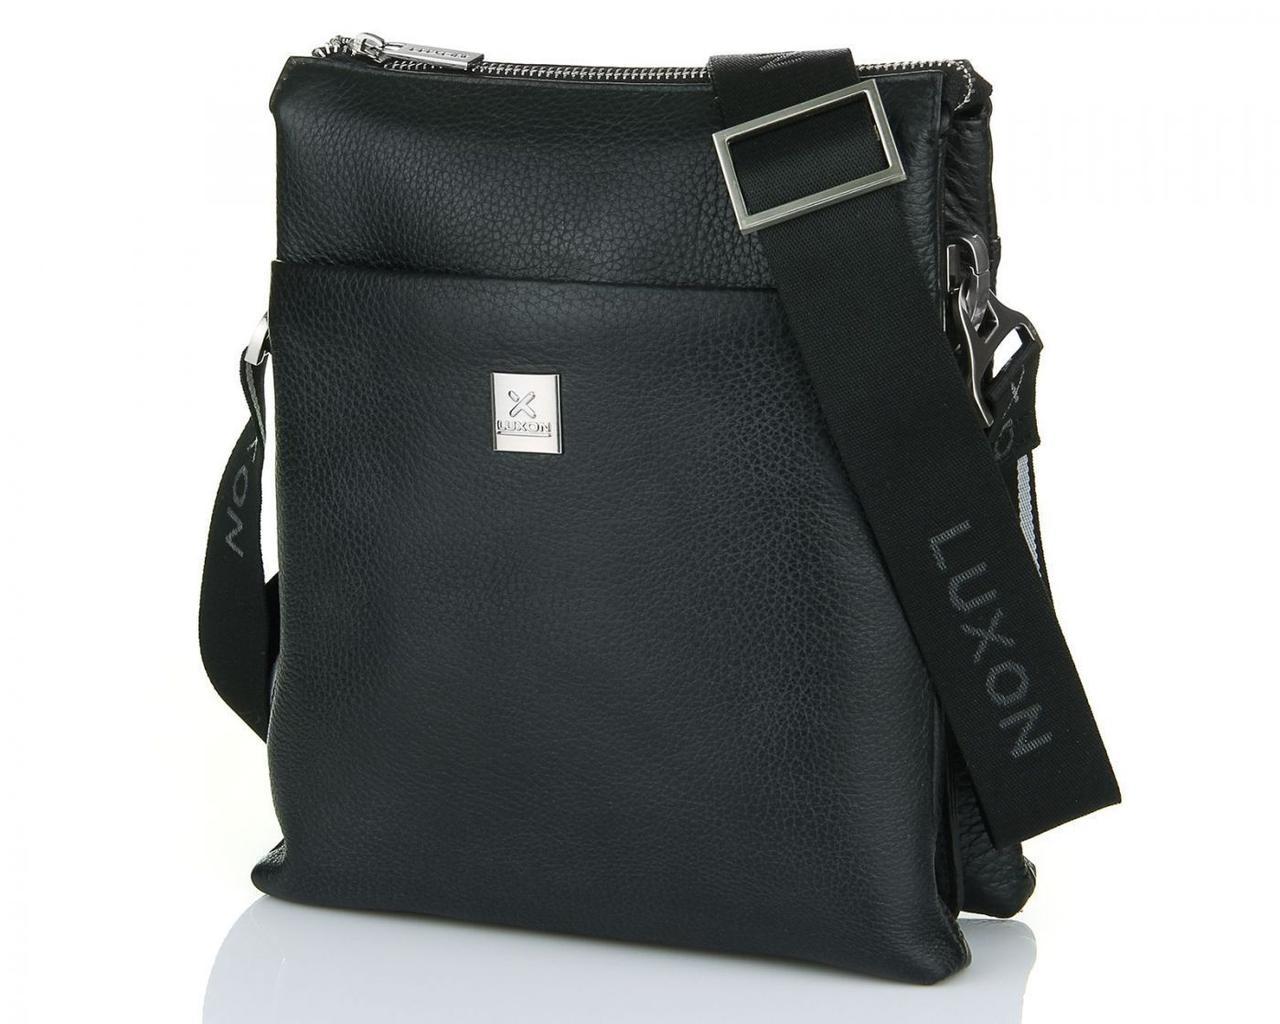 Мужская сумка без клапана Luxon 8832-1